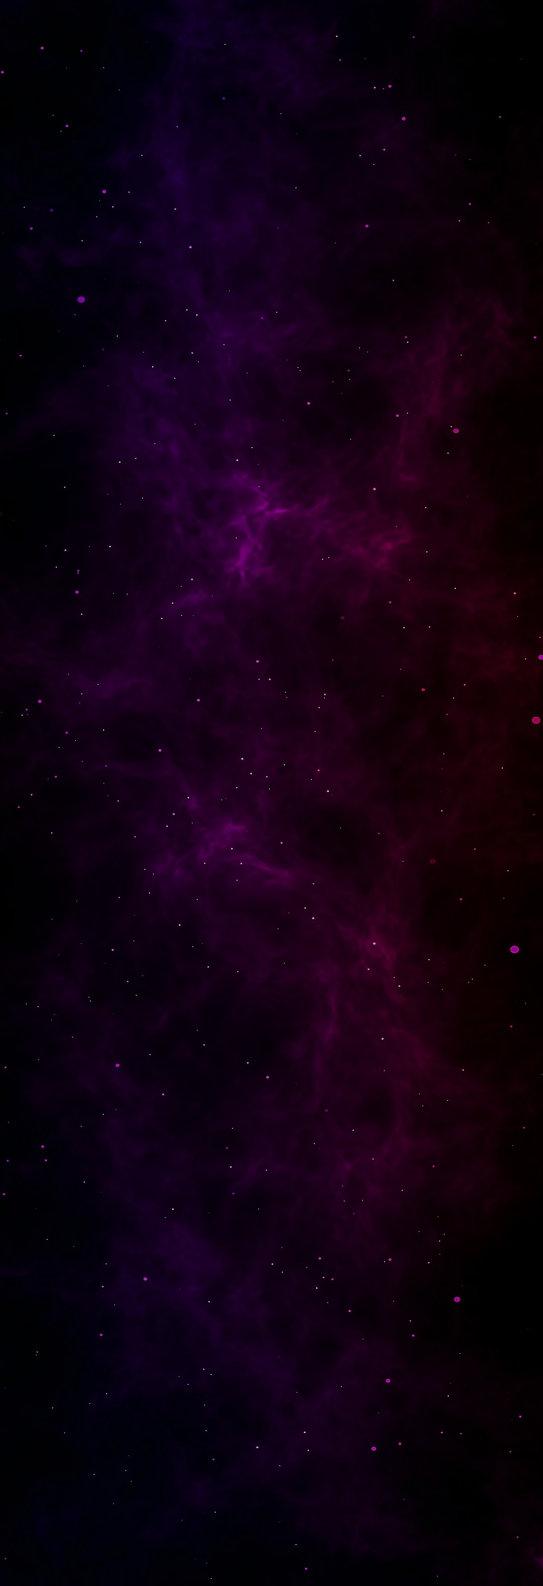 2021 - Faixa 2 - Background - v2_edited.jpg